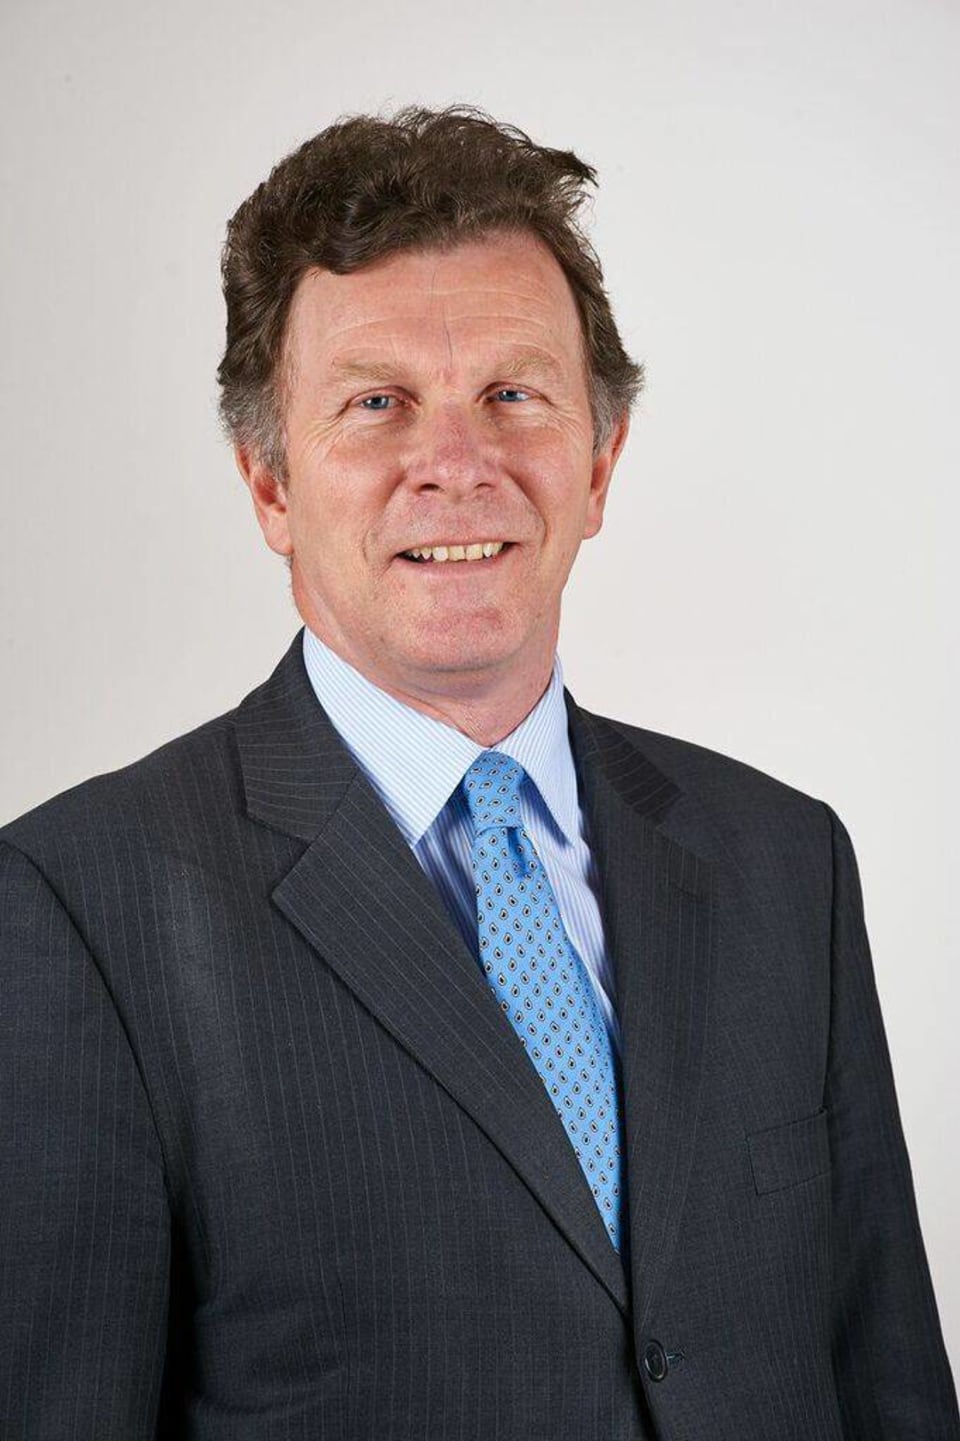 Andrew Maclay